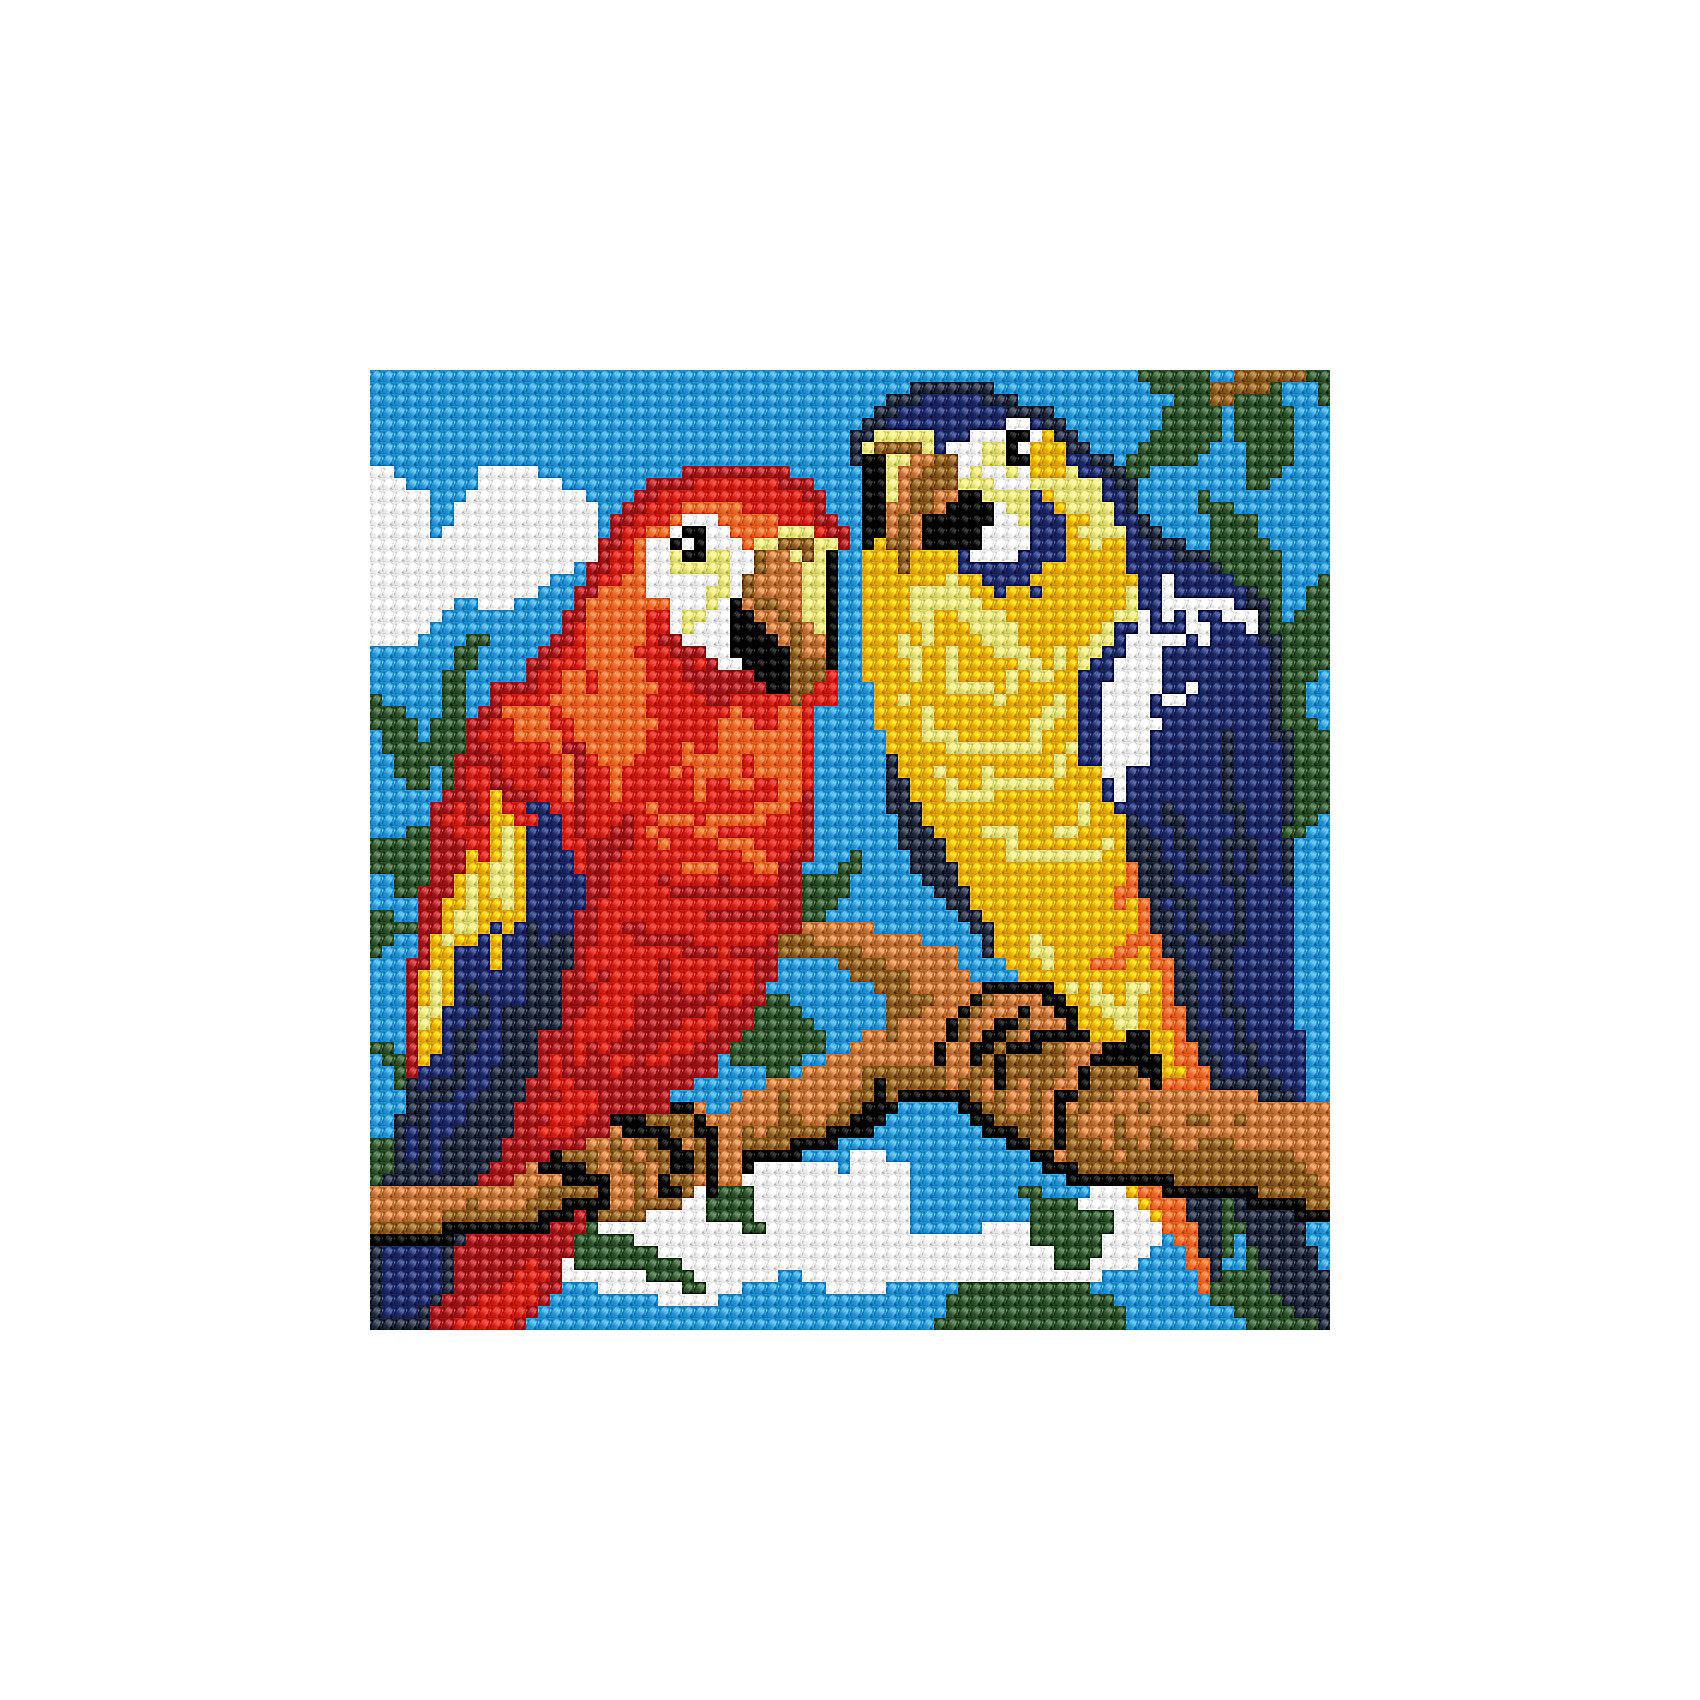 Schreiber Алмазная мозаика по номерами Попугаи 20*20 см schreiber алмазная мозаика по номерами белочка 20 20 см